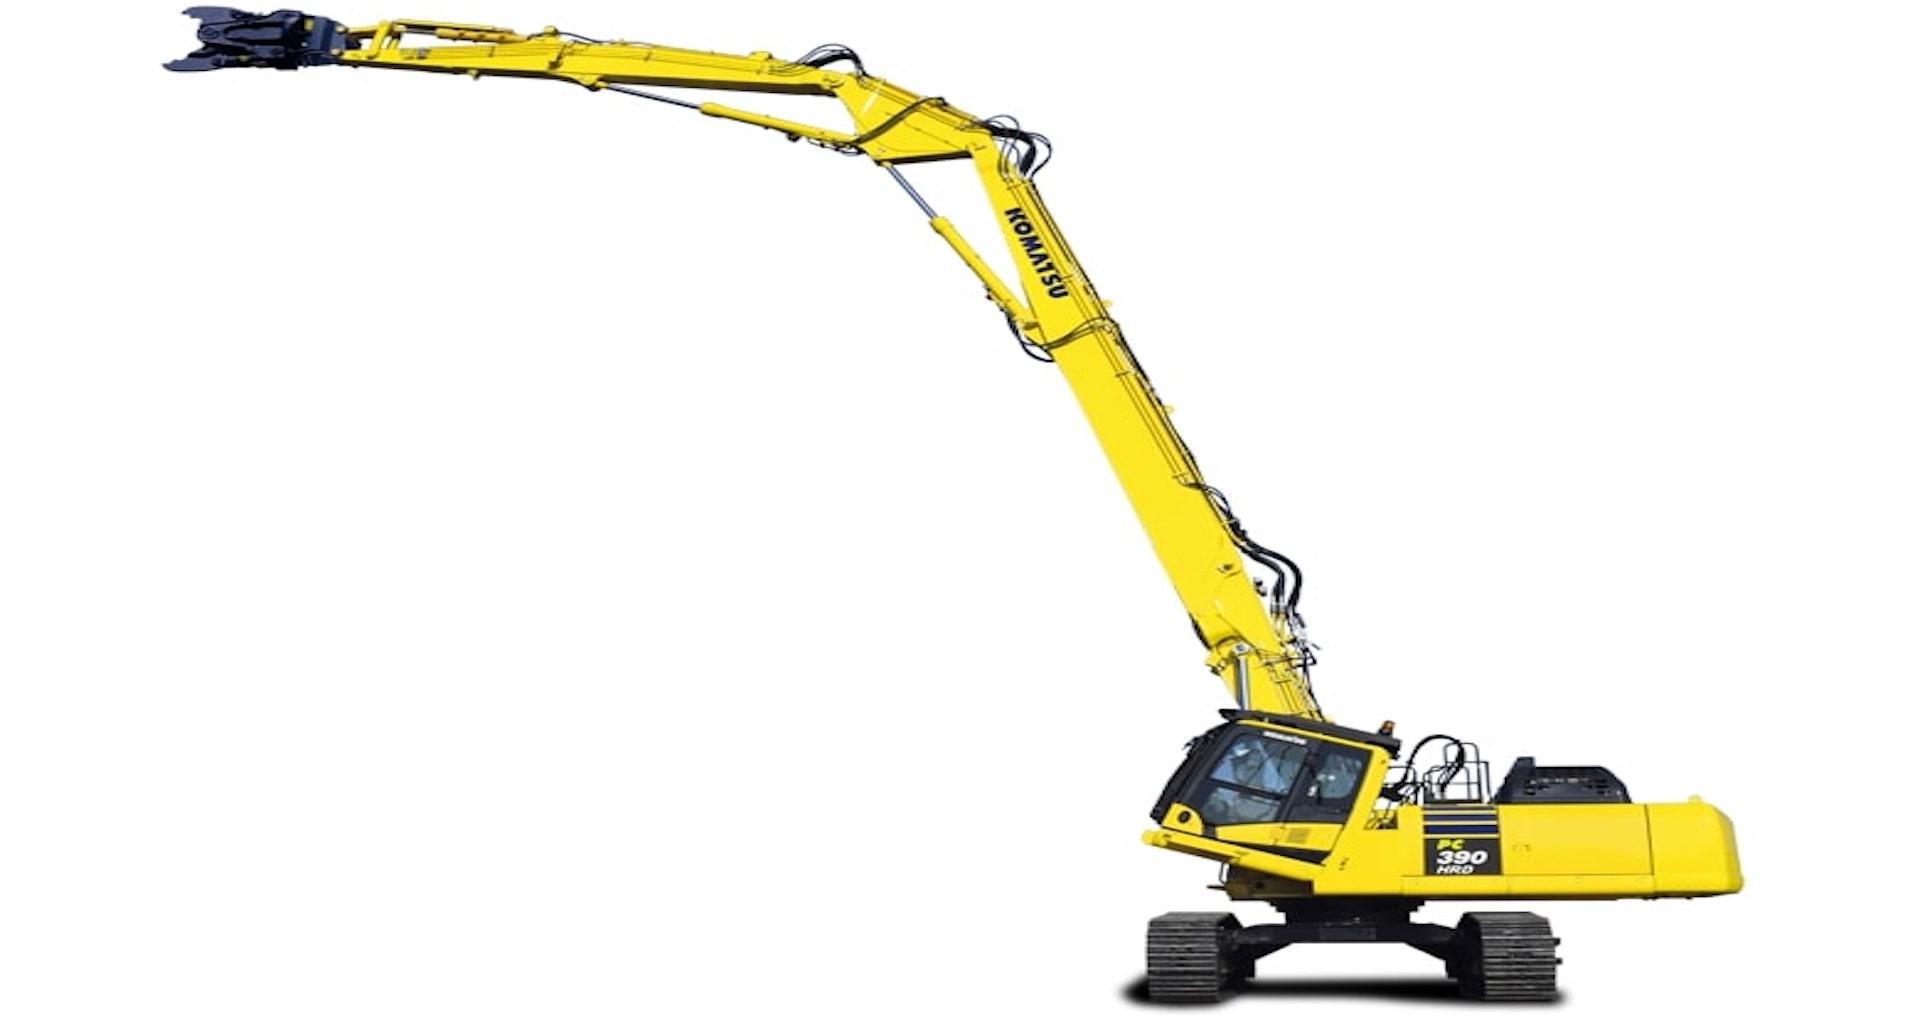 Escavatore cingolato demolition Komatsu PC390HRD-11